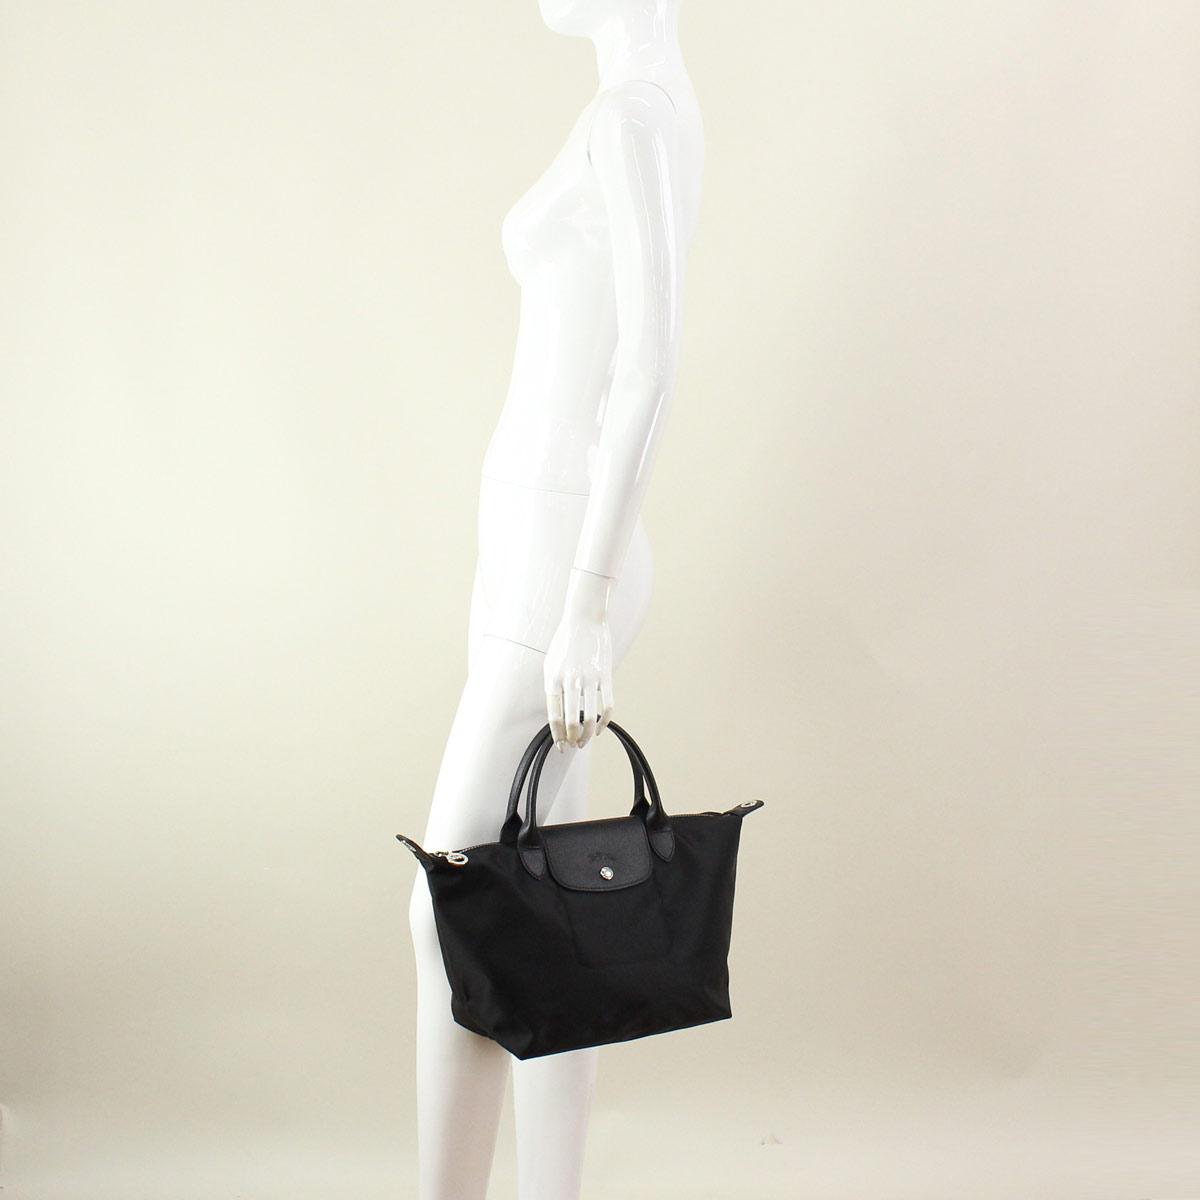 (LONGCHAMP) Longchamp handbags 1512-578-001 black( taxfree/send by EMS/authentic/A brand new item )